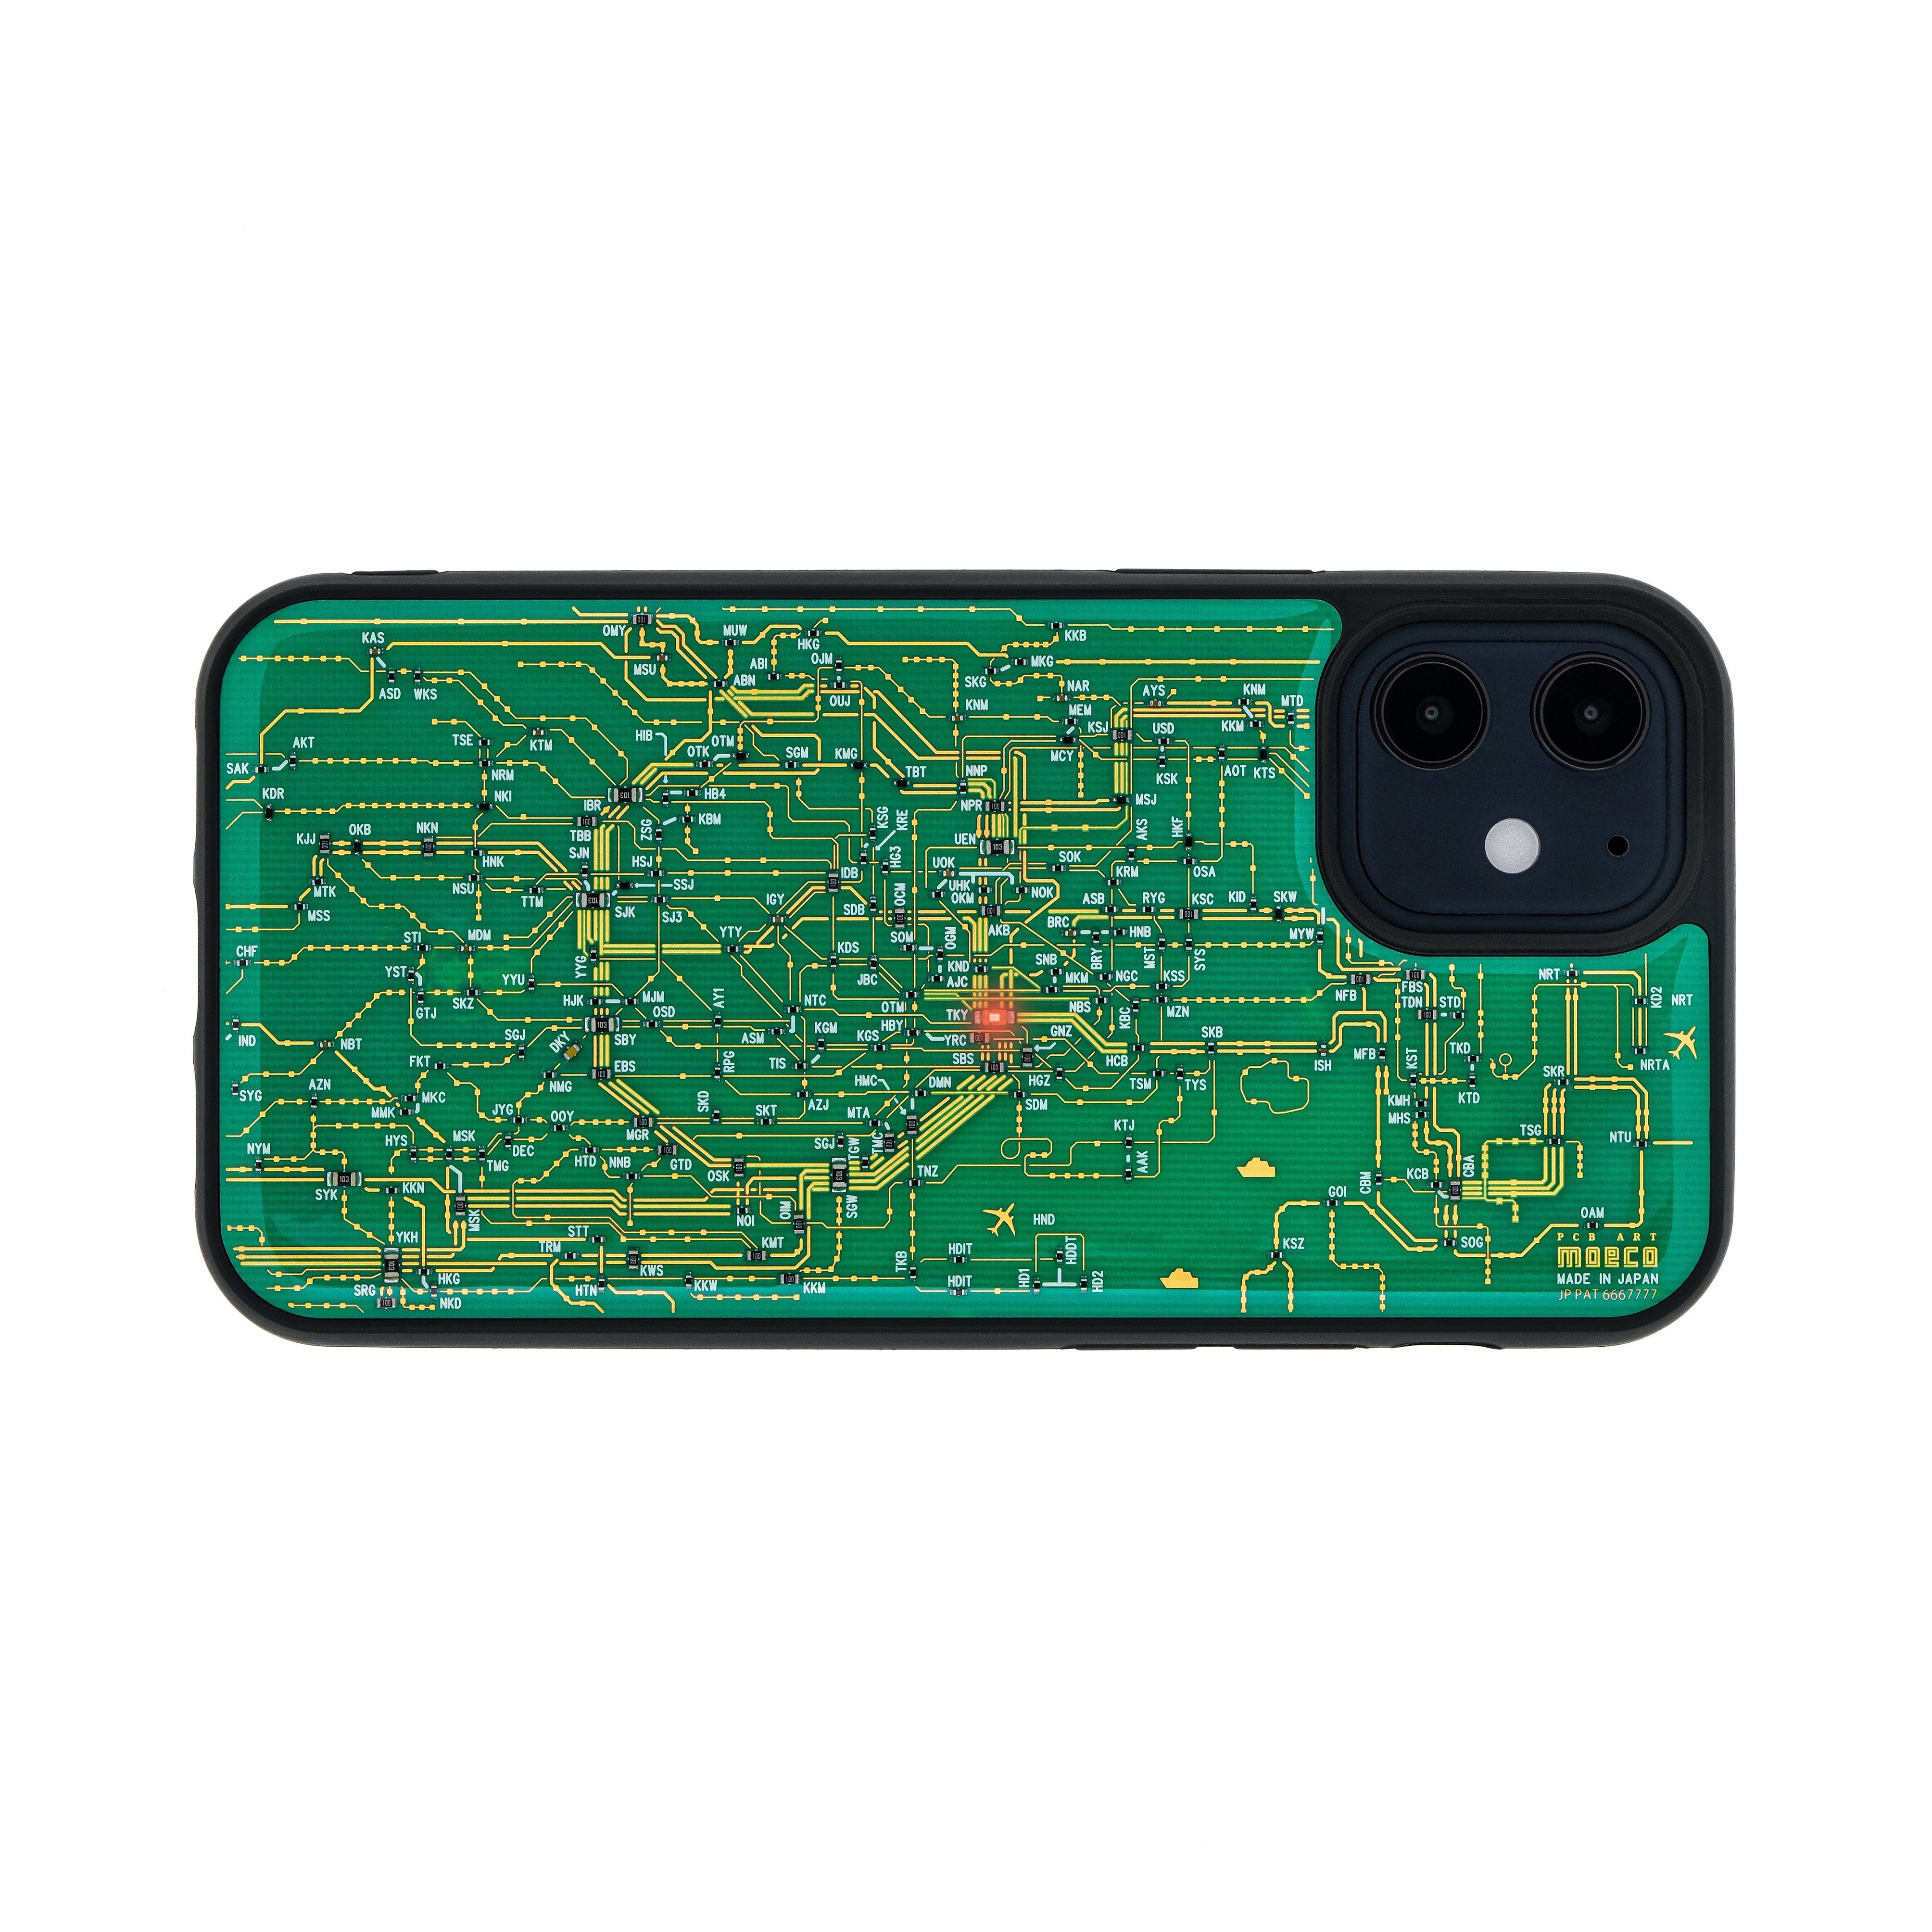 FLASH 東京回路線図 iPhone 12 mini ケース 緑【東京回路線図A5クリアファイルをプレゼント】